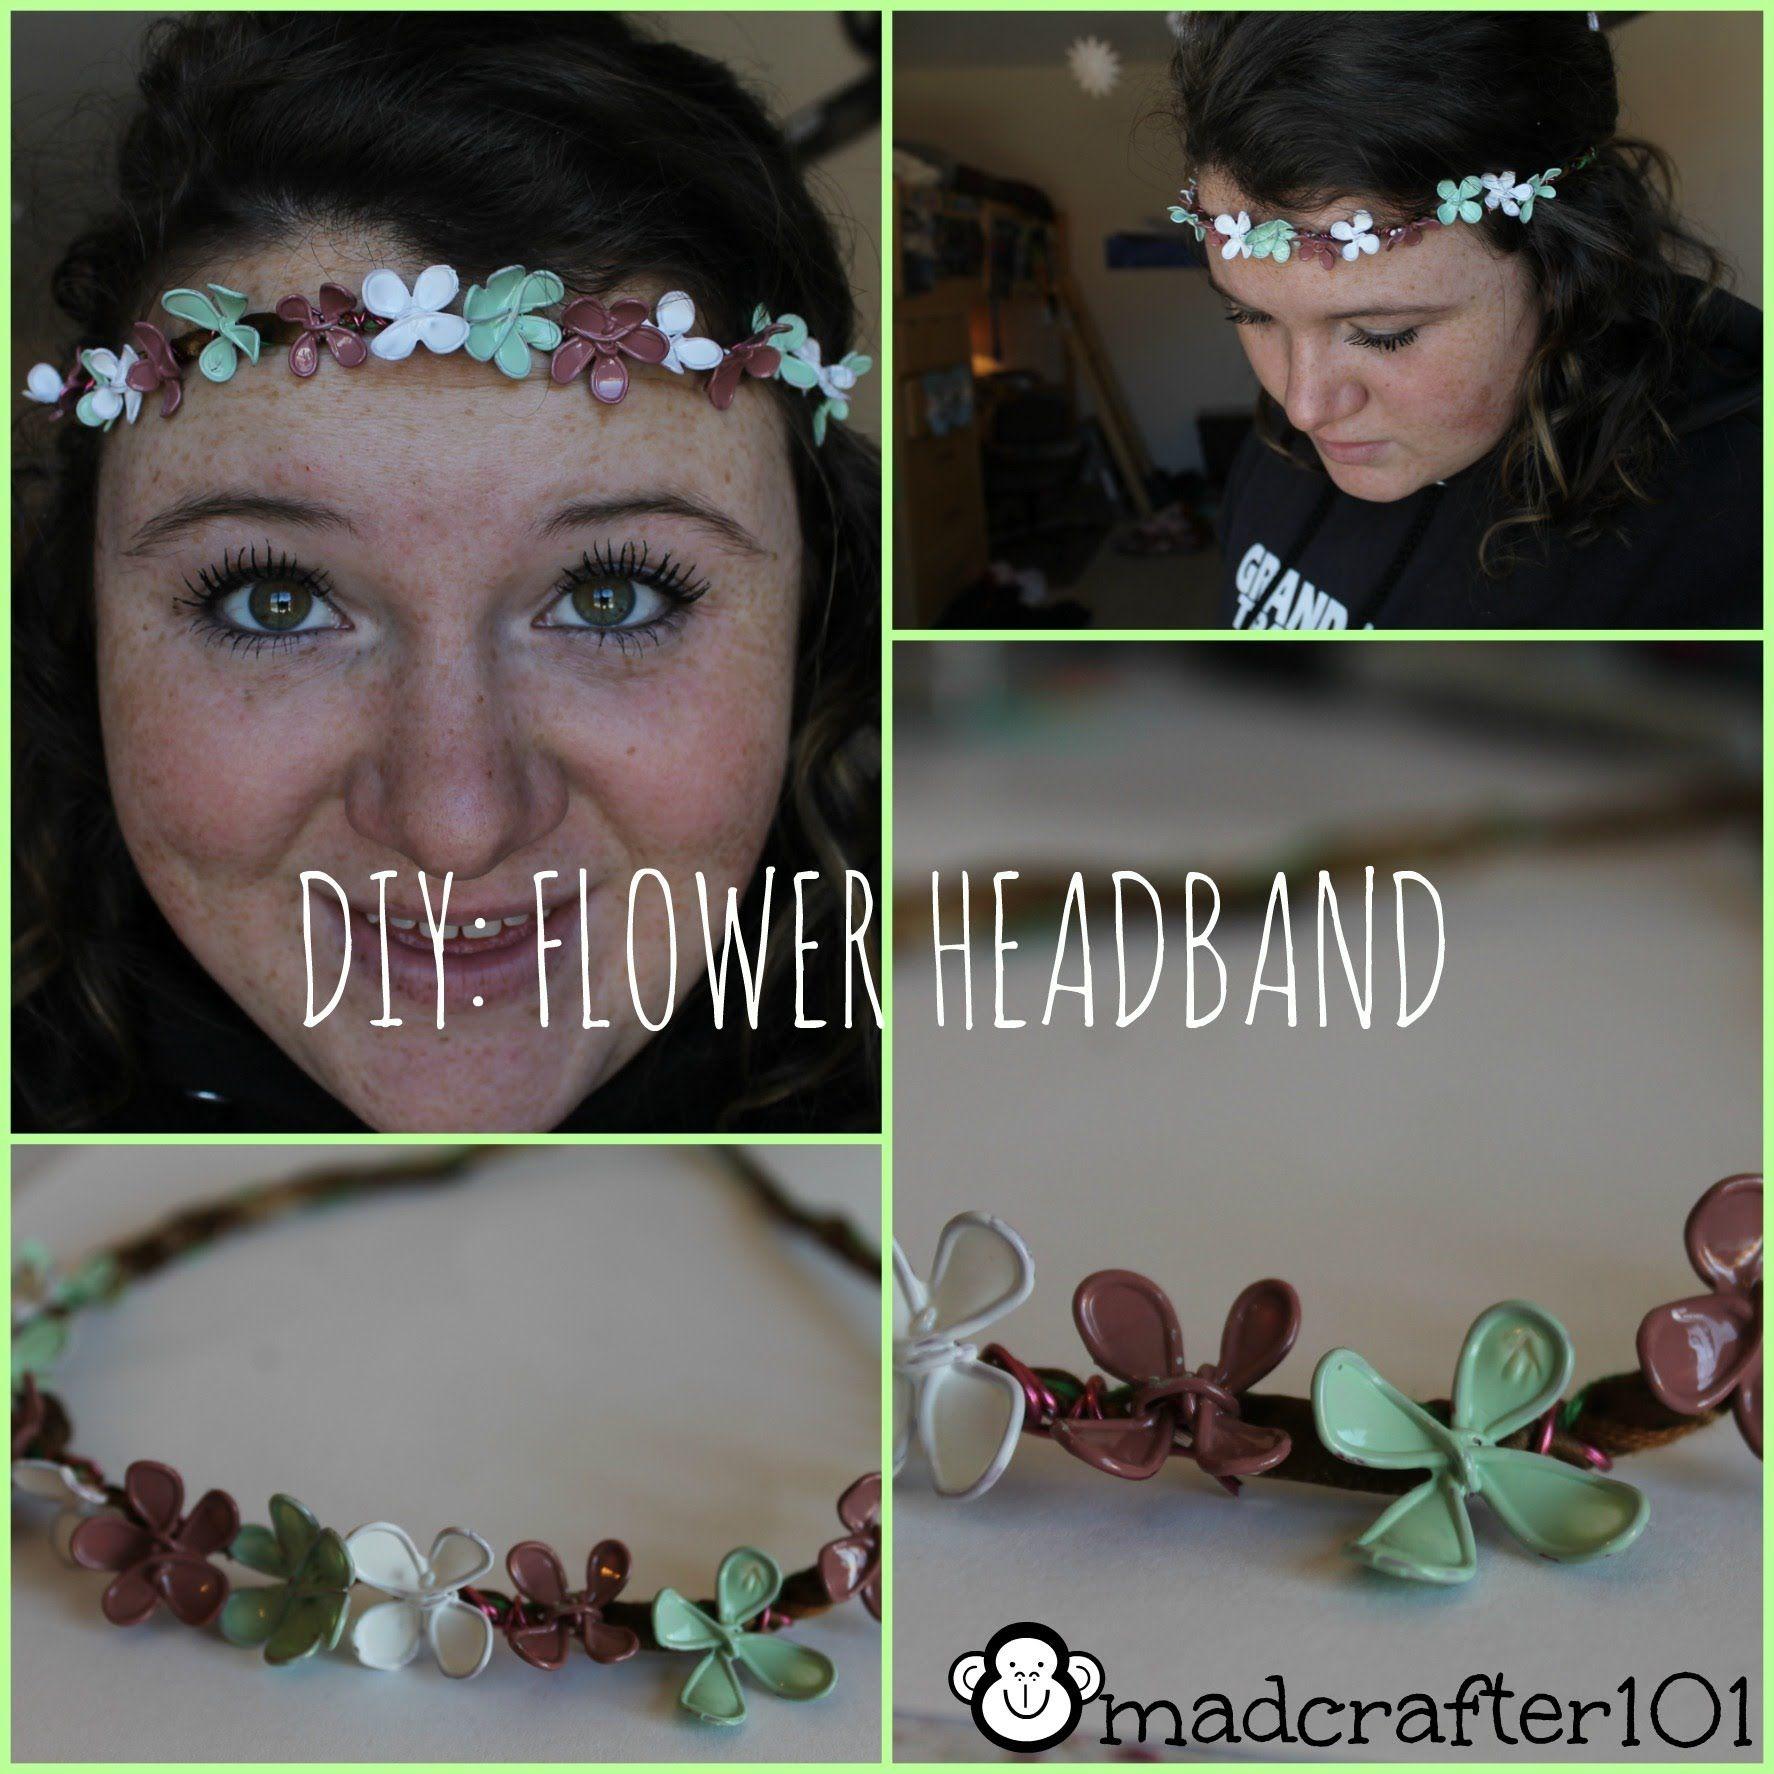 Easy DIY for a new kind of flower headband!